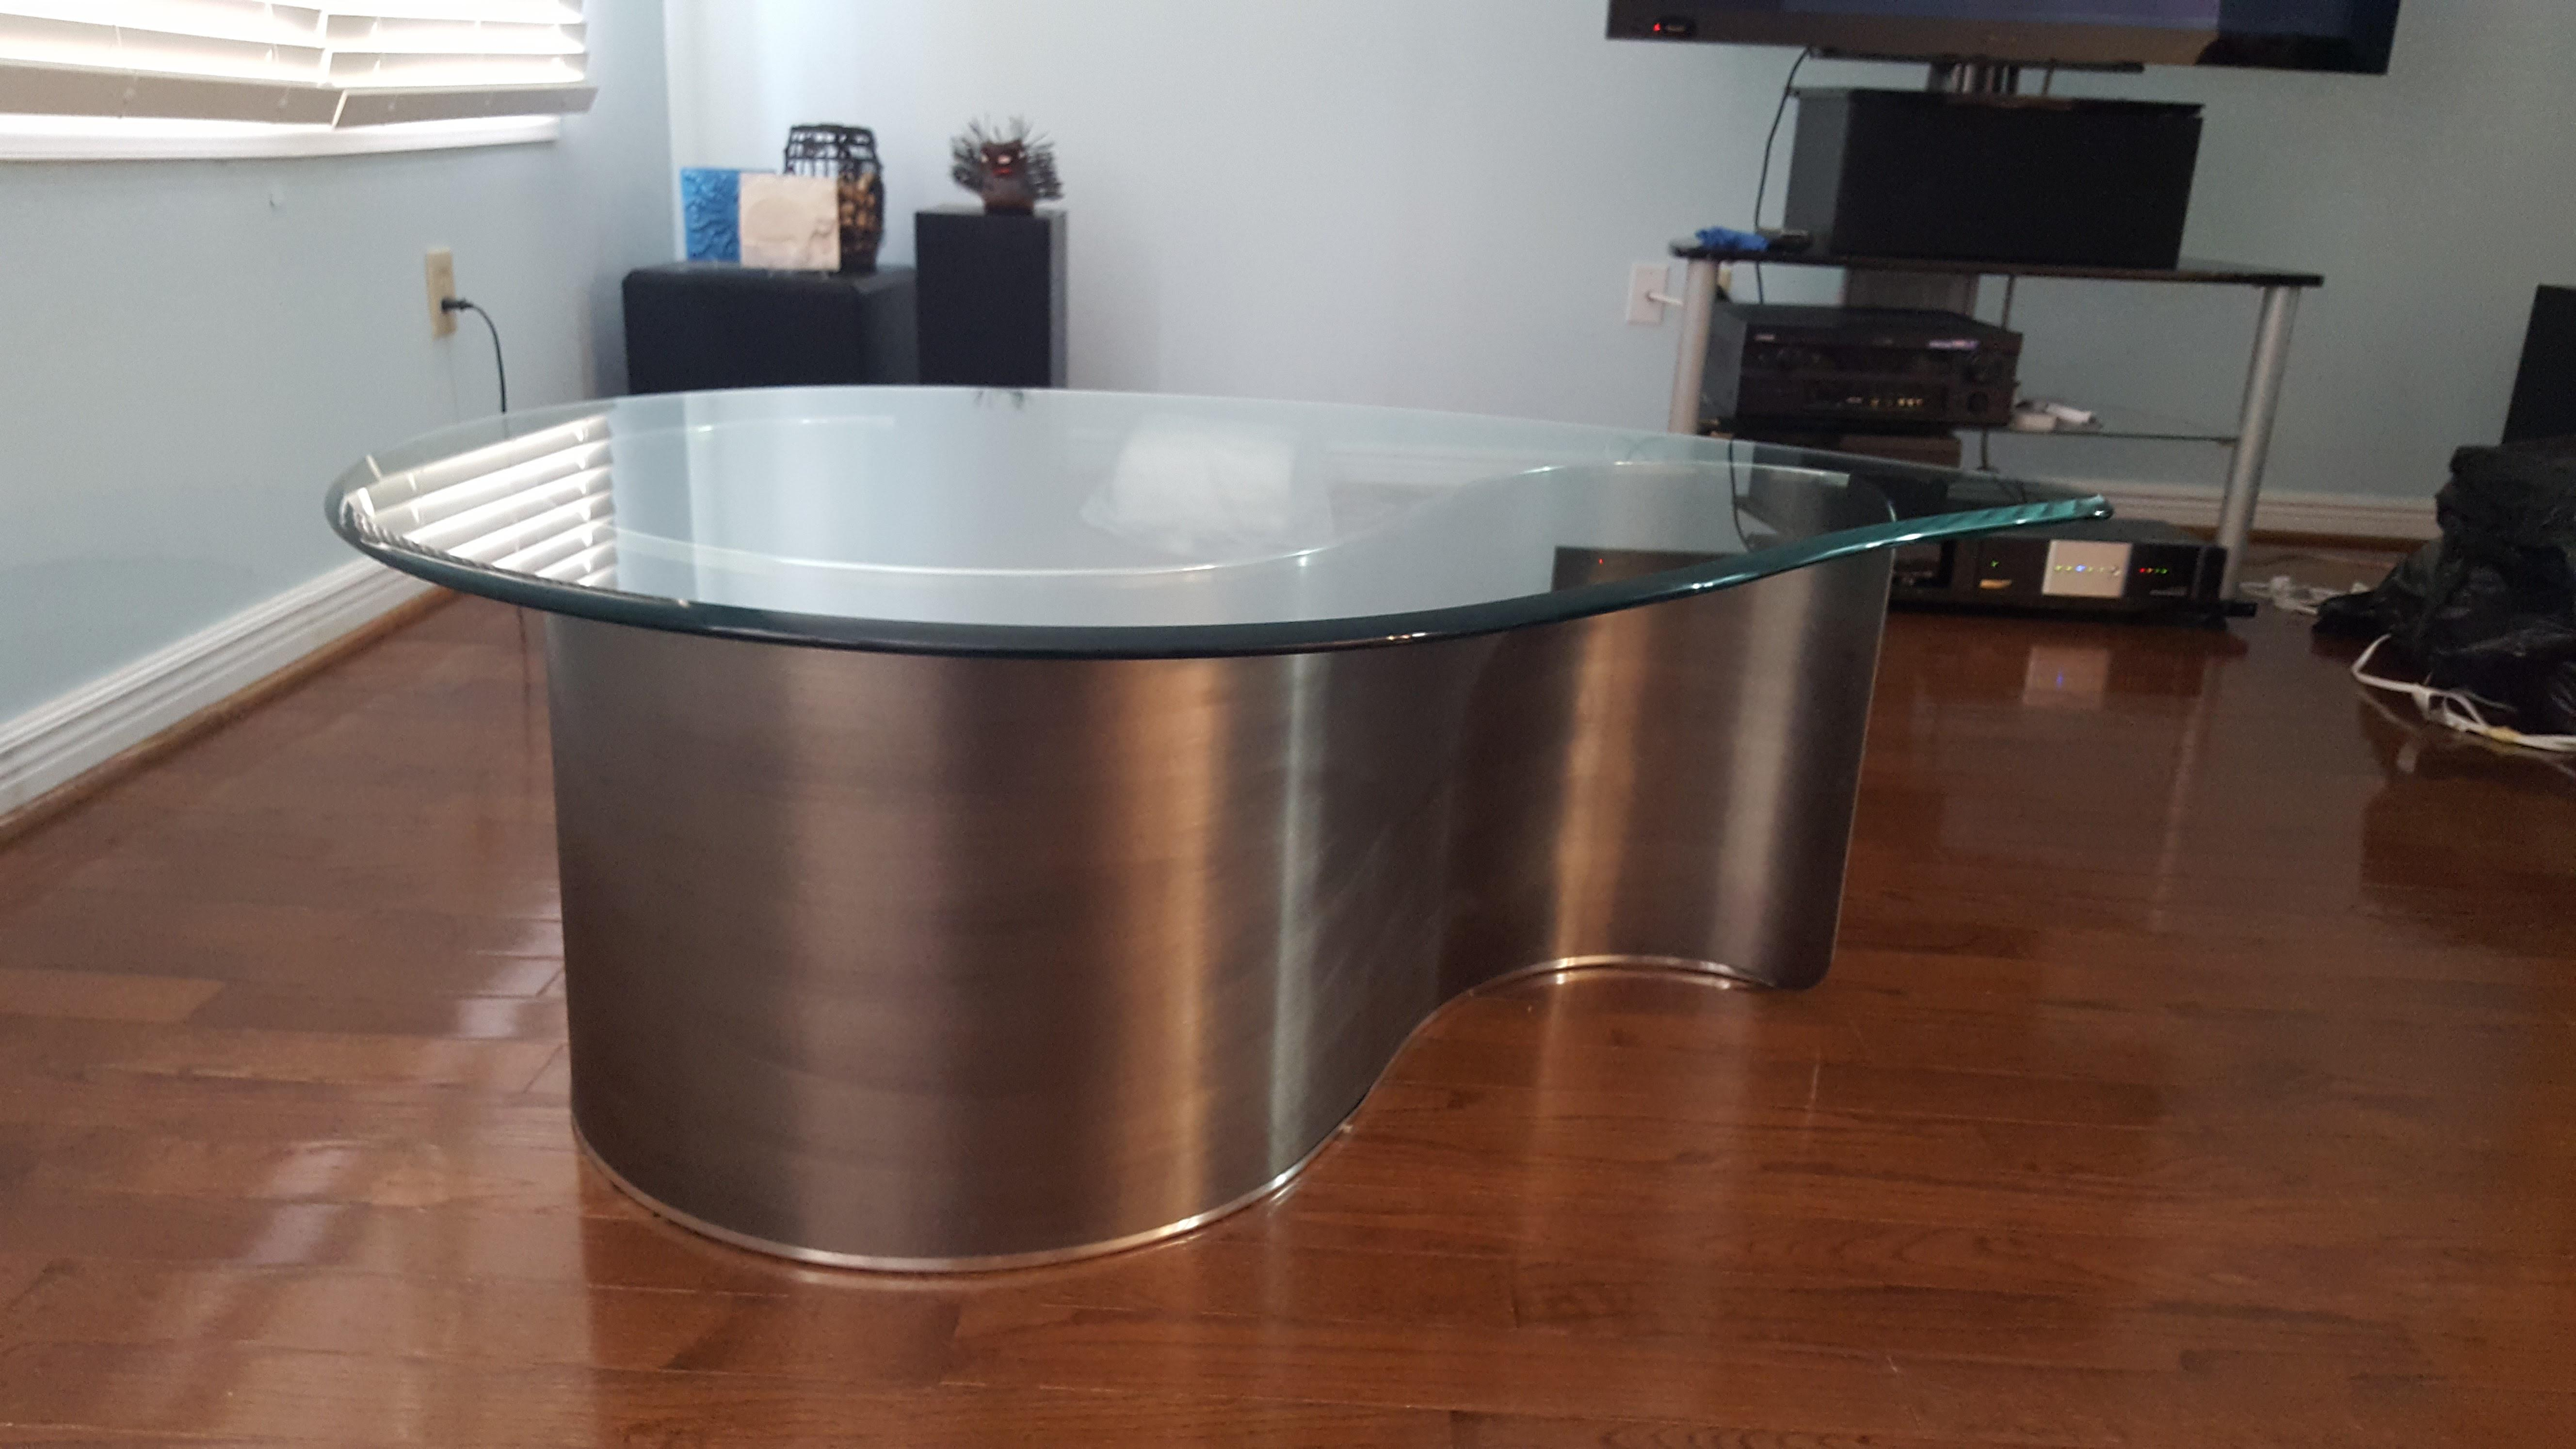 Kagan Style Mid Century Modern Glass Metal Biomorphic Coffee Table. $500.  Kagan Style Mid Century Modern Glass Metal Biomorphic Coffee Table ...